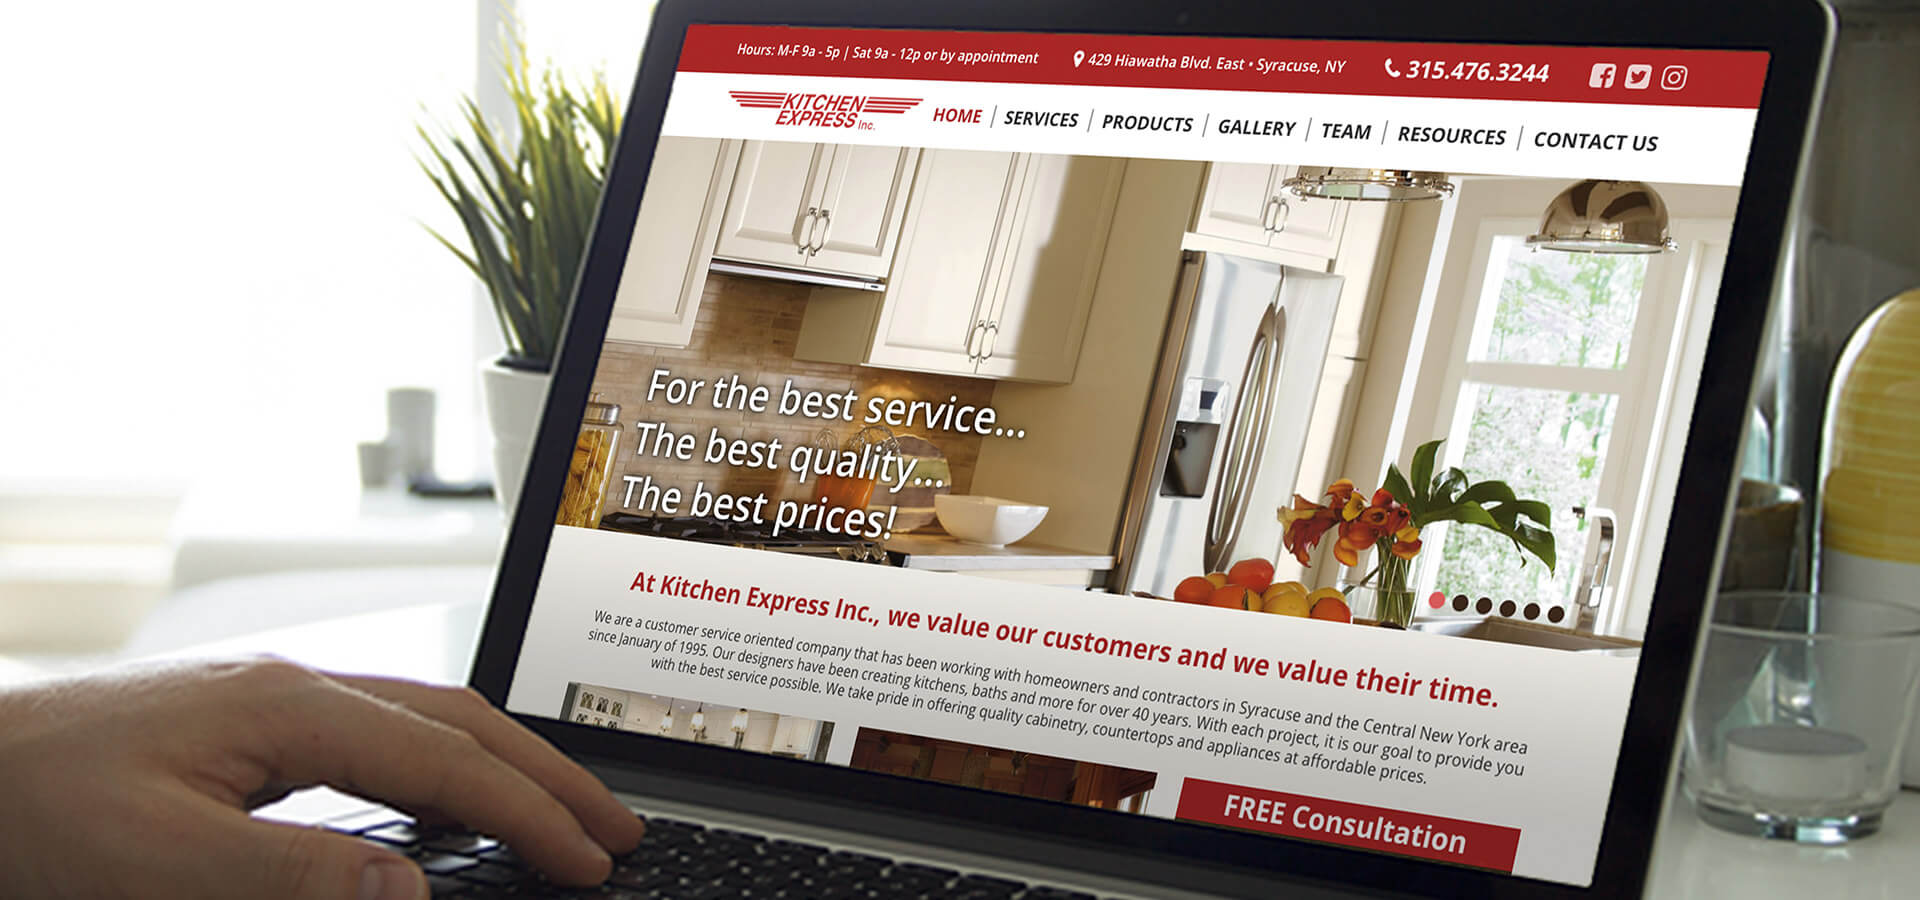 Kitchen Express Inc.'s New Website on Laptop